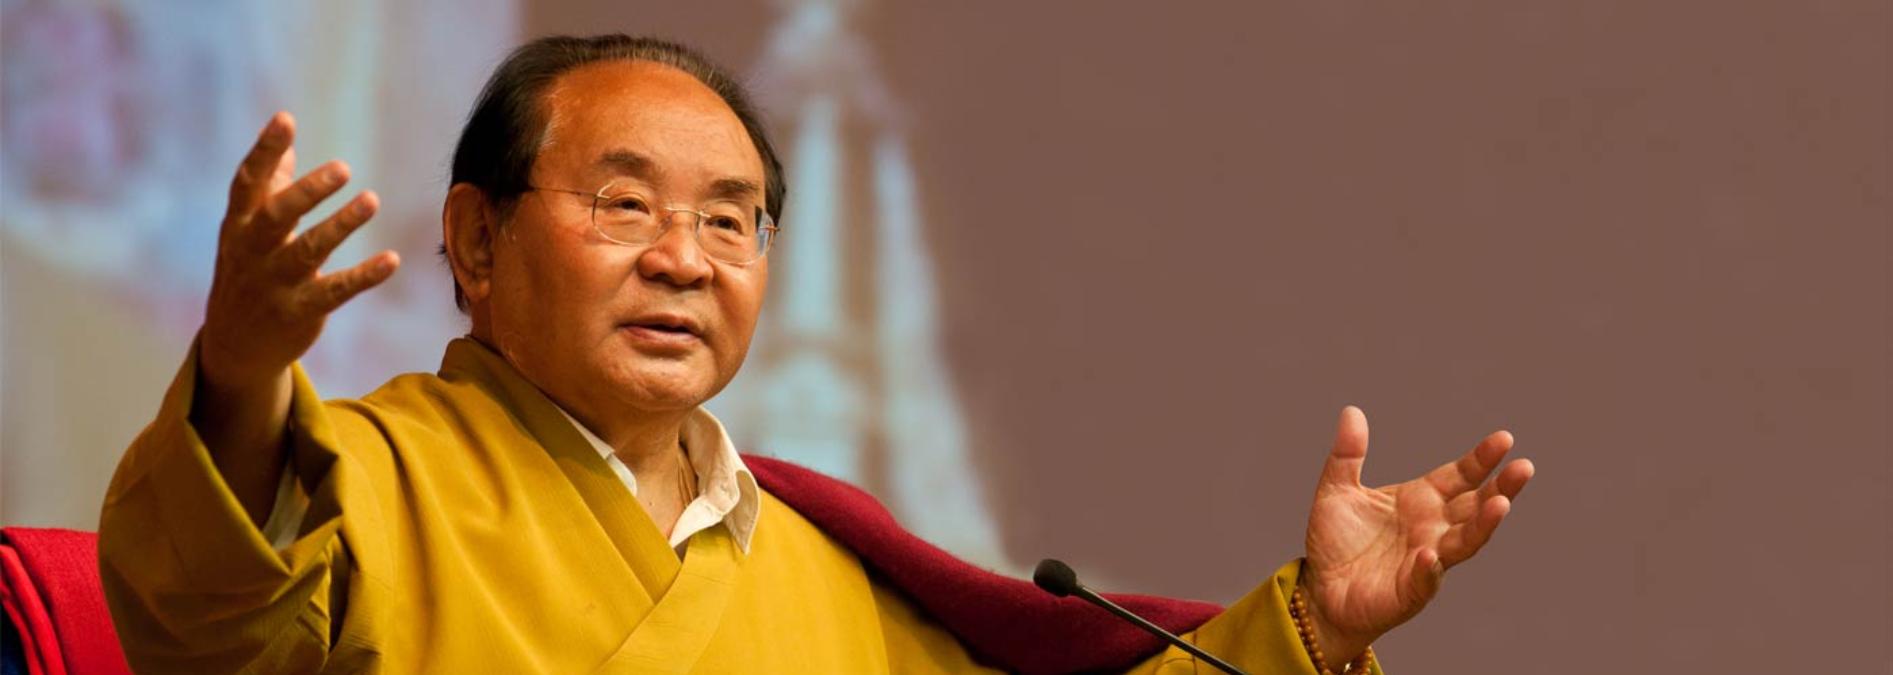 Screenshot_2019-08-30 Paying Homage to Sogyal Rinpoche — Sogyal Rinpoche.png